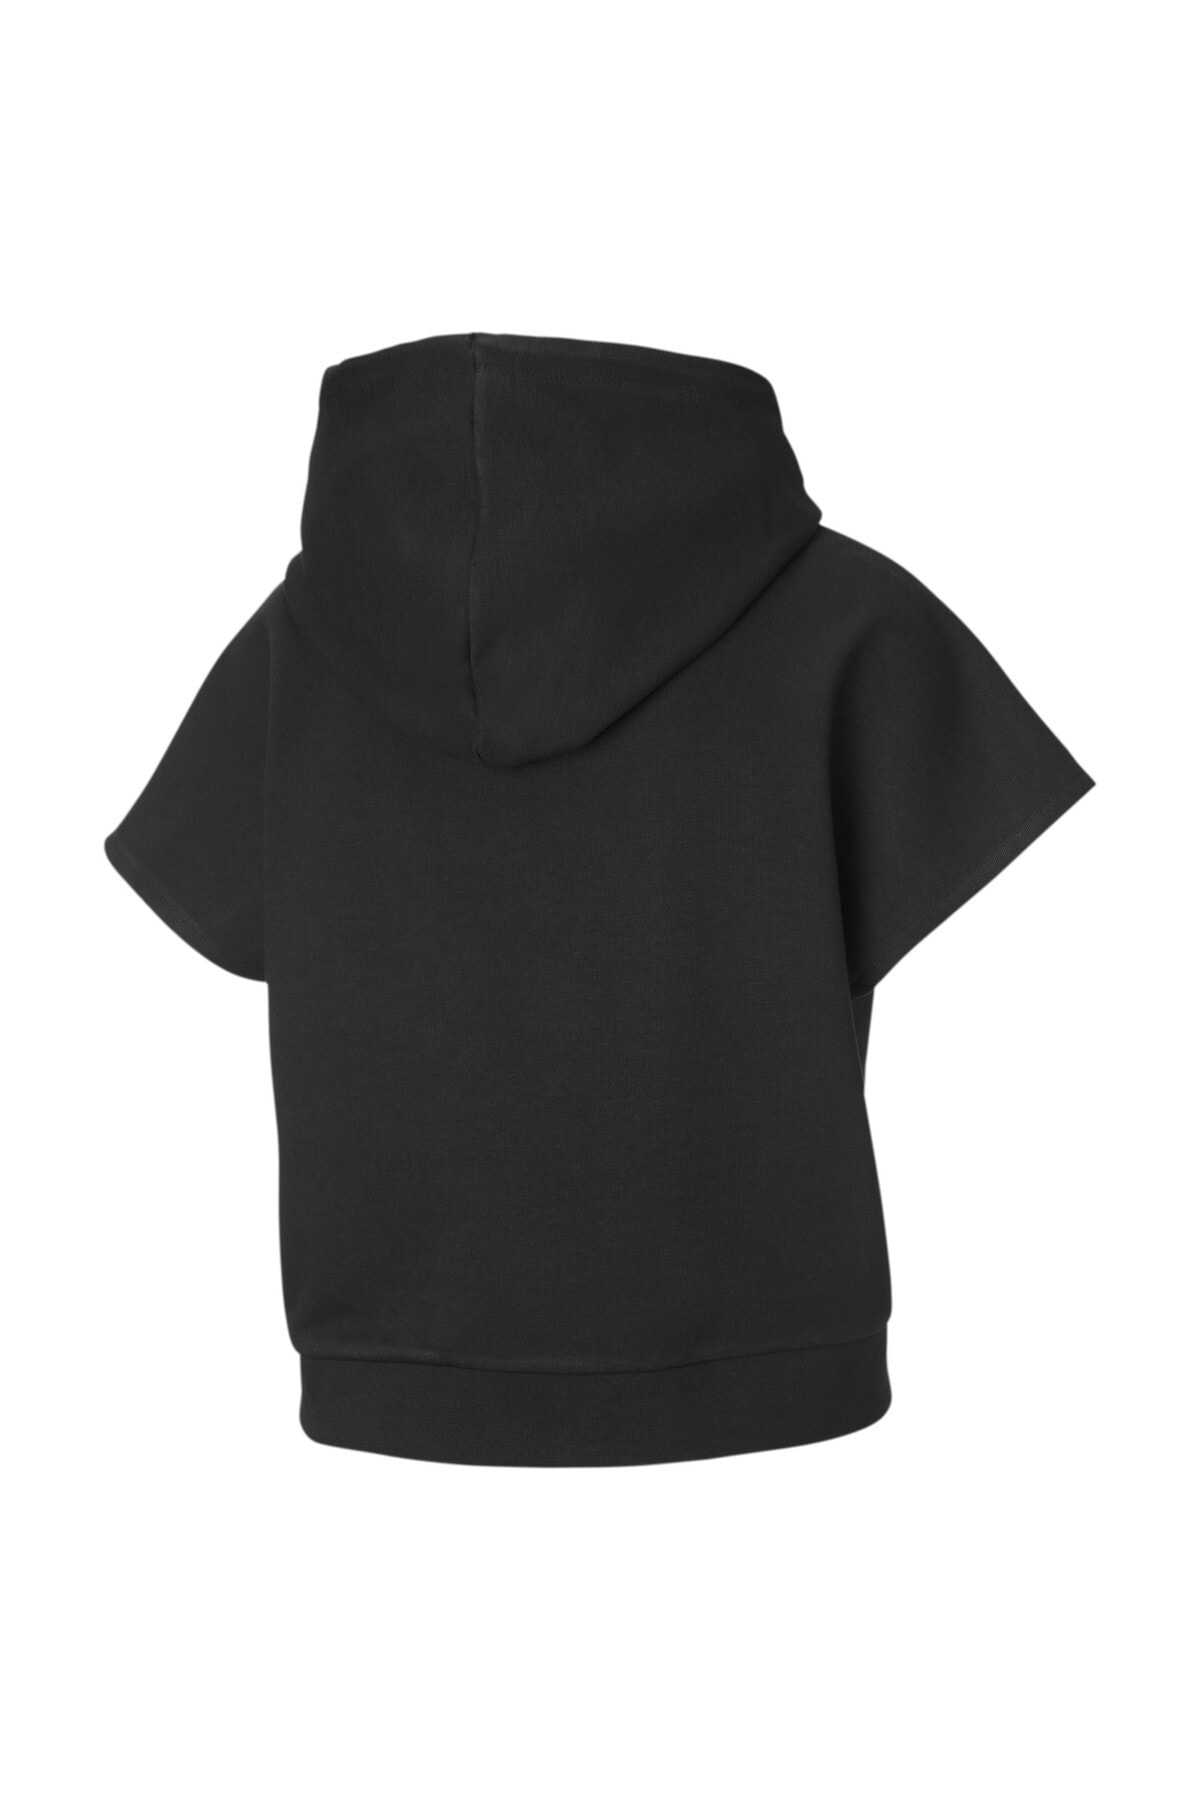 Puma Kadın Siyah Kısa Kollu Spor Sweatshirt 2